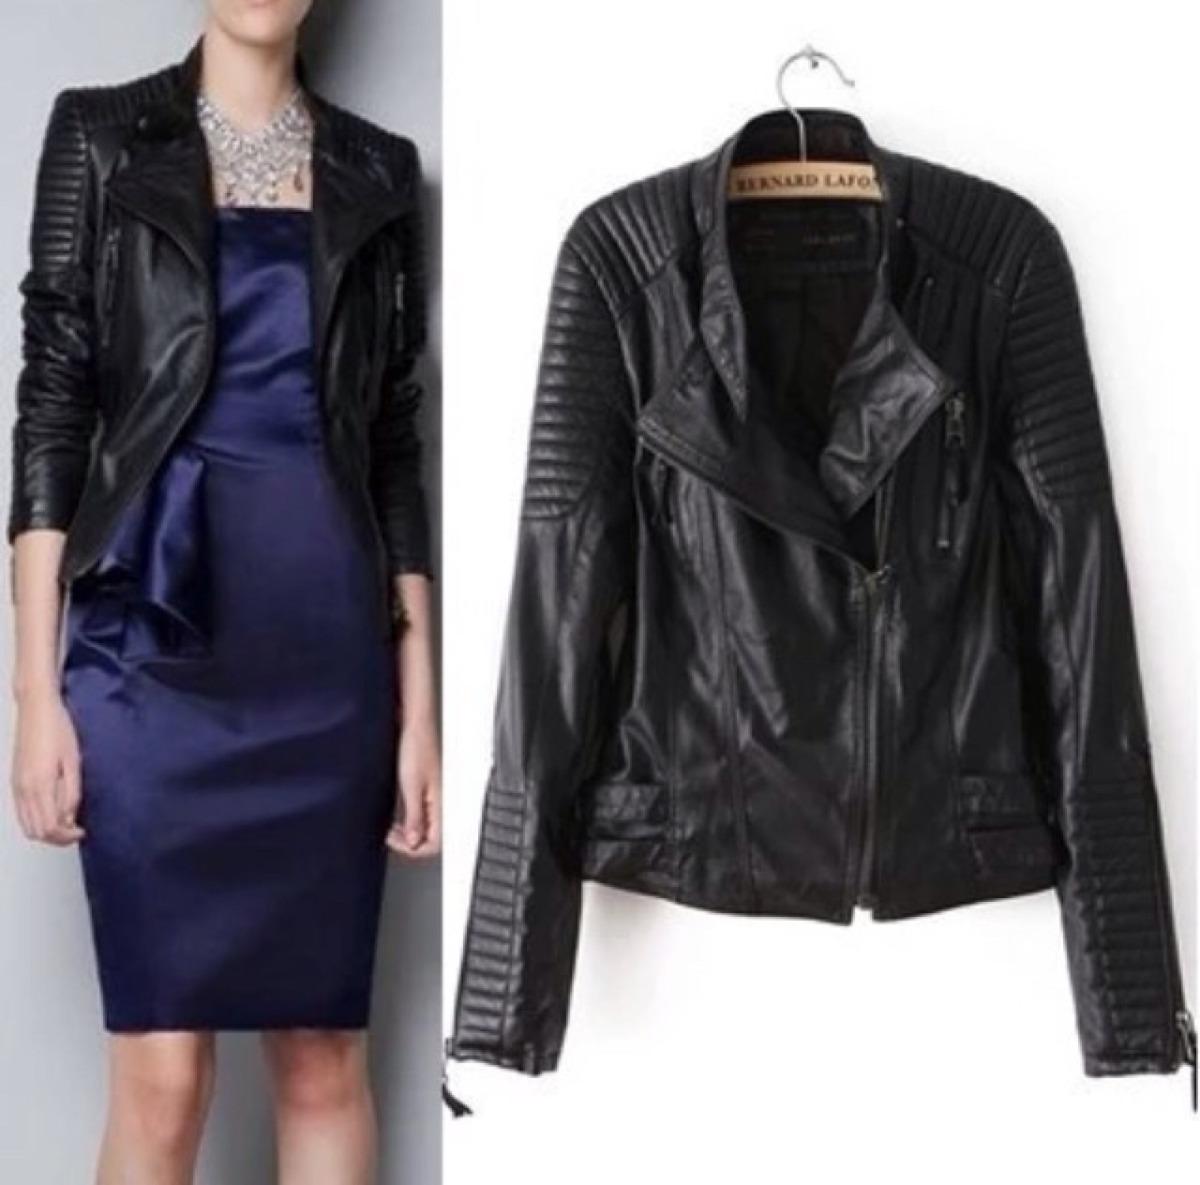 13214c94a01dd jaqueta couro feminina preta m pronta entrega. Carregando zoom.